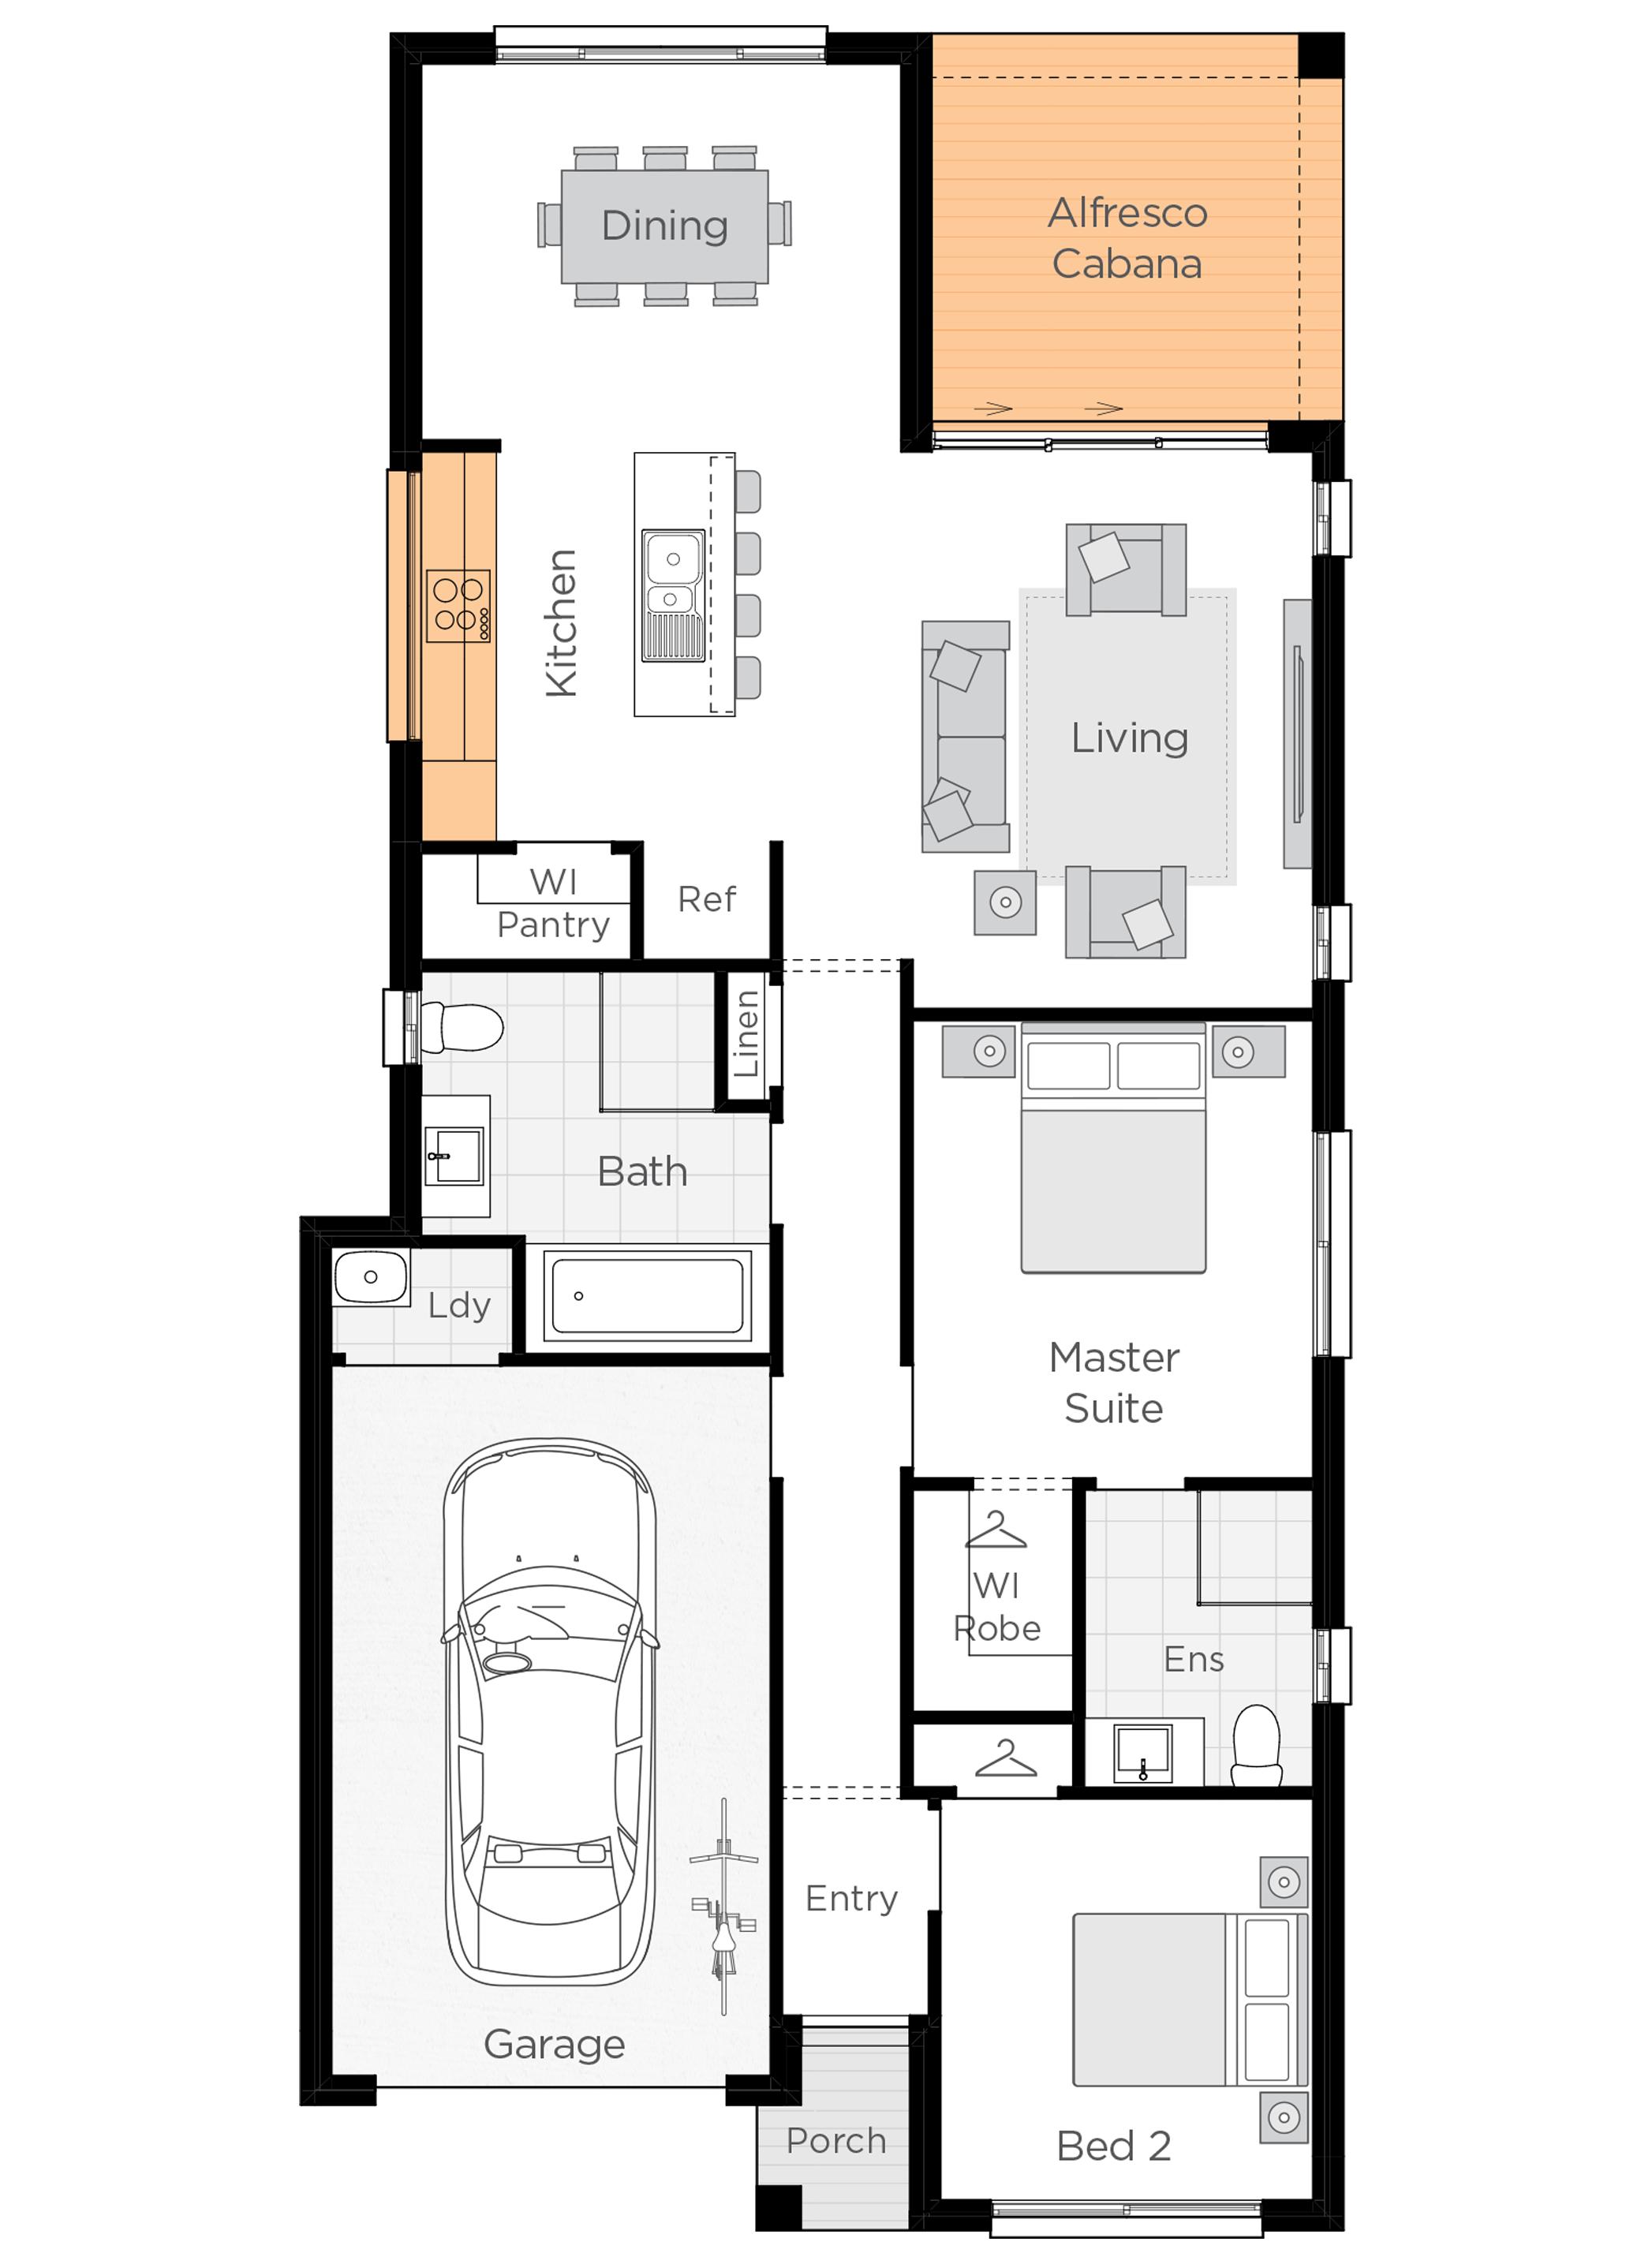 Sienna - Upgraded Plan